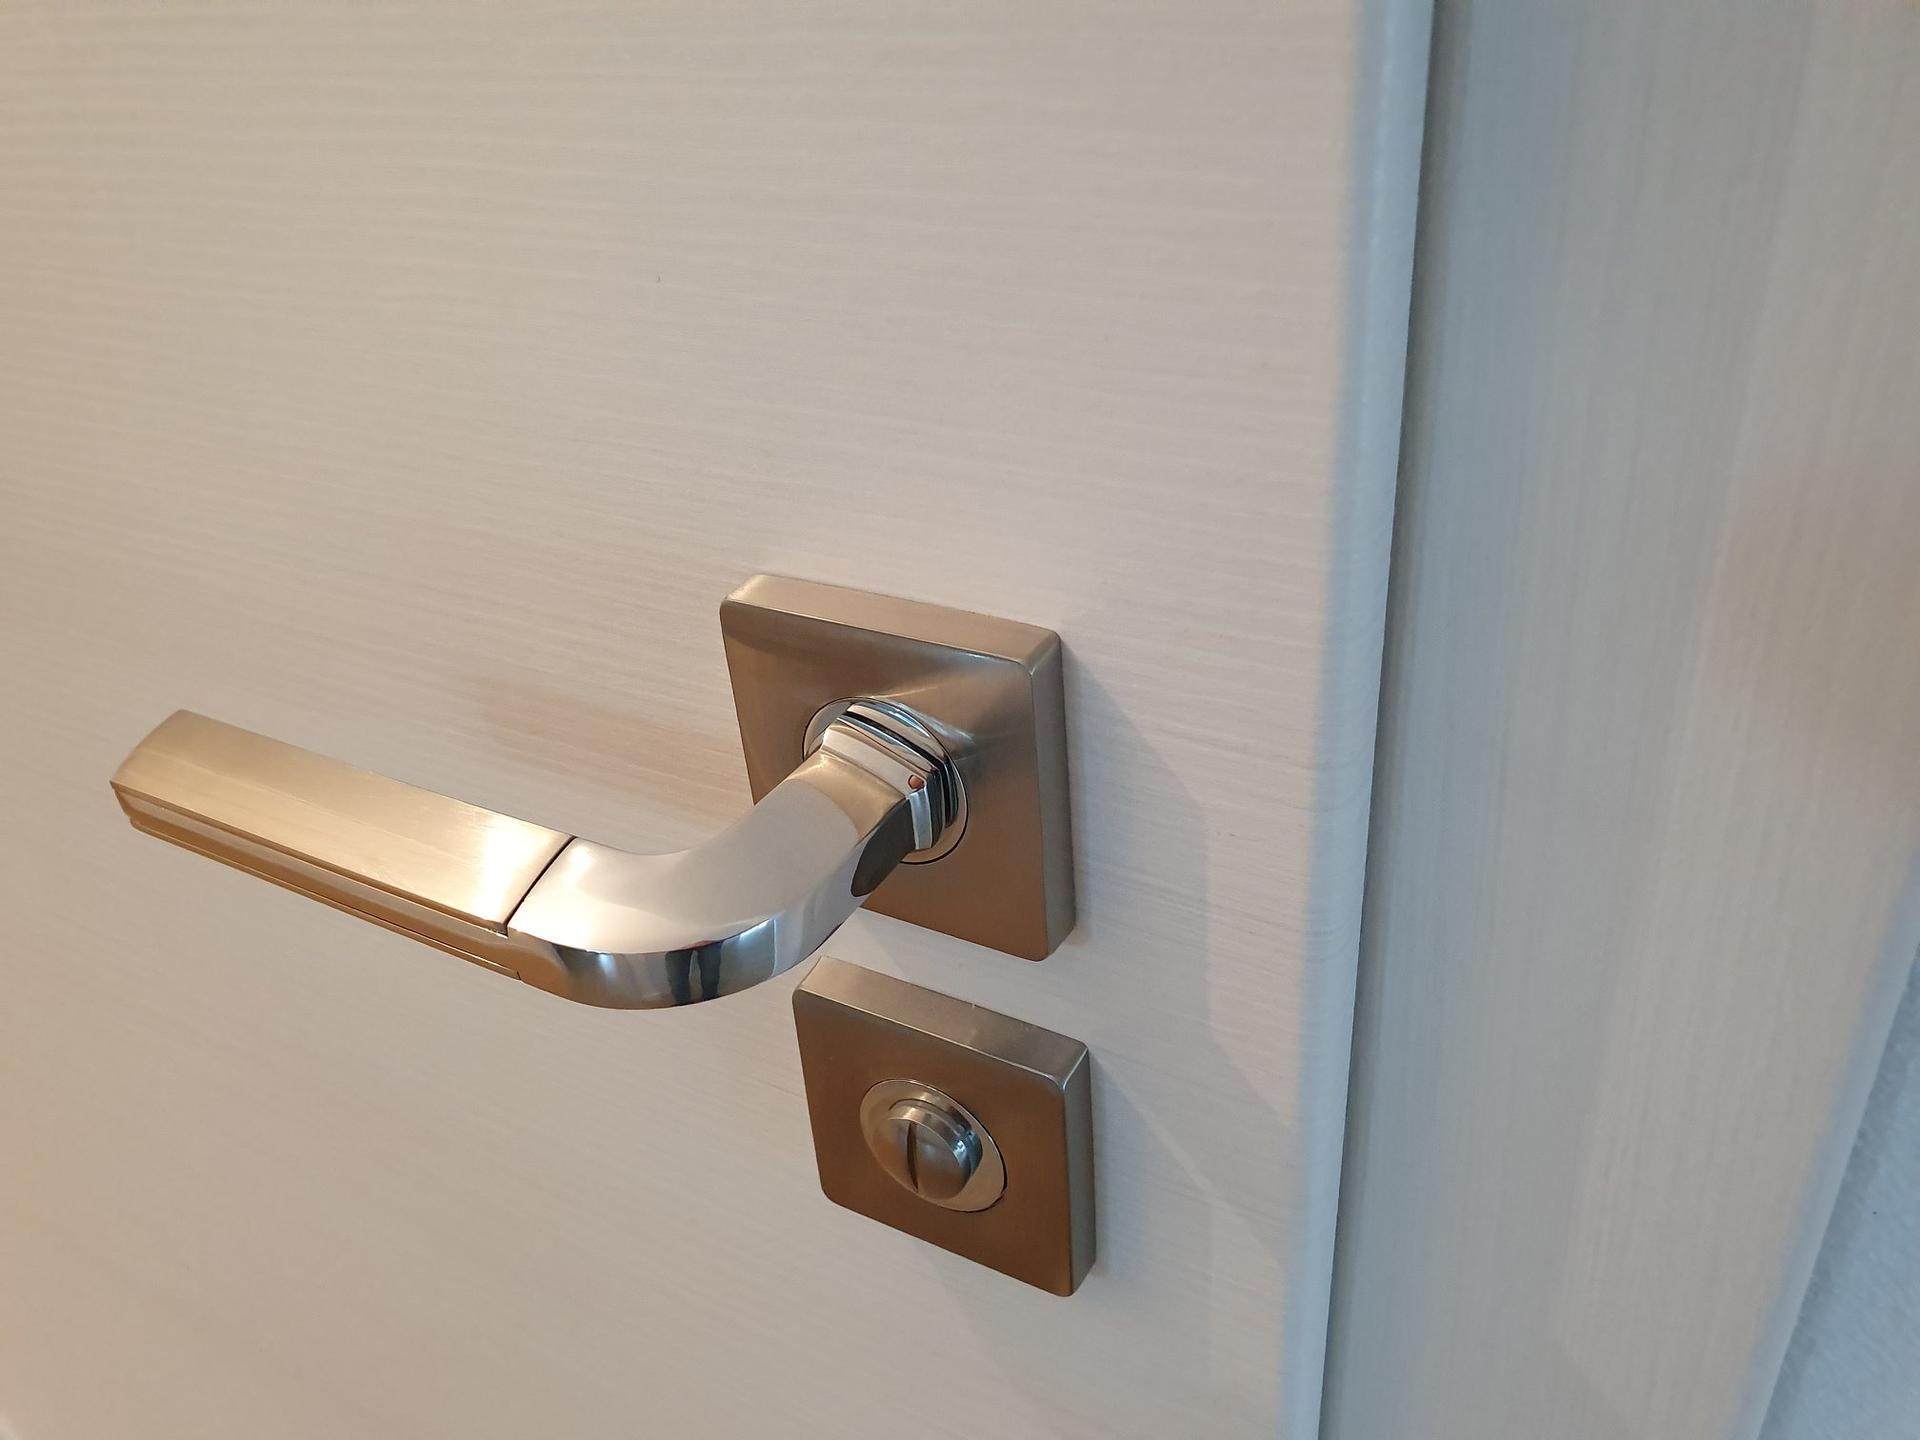 Co vyberem za dvere? - Prum, dekor touch white - detail